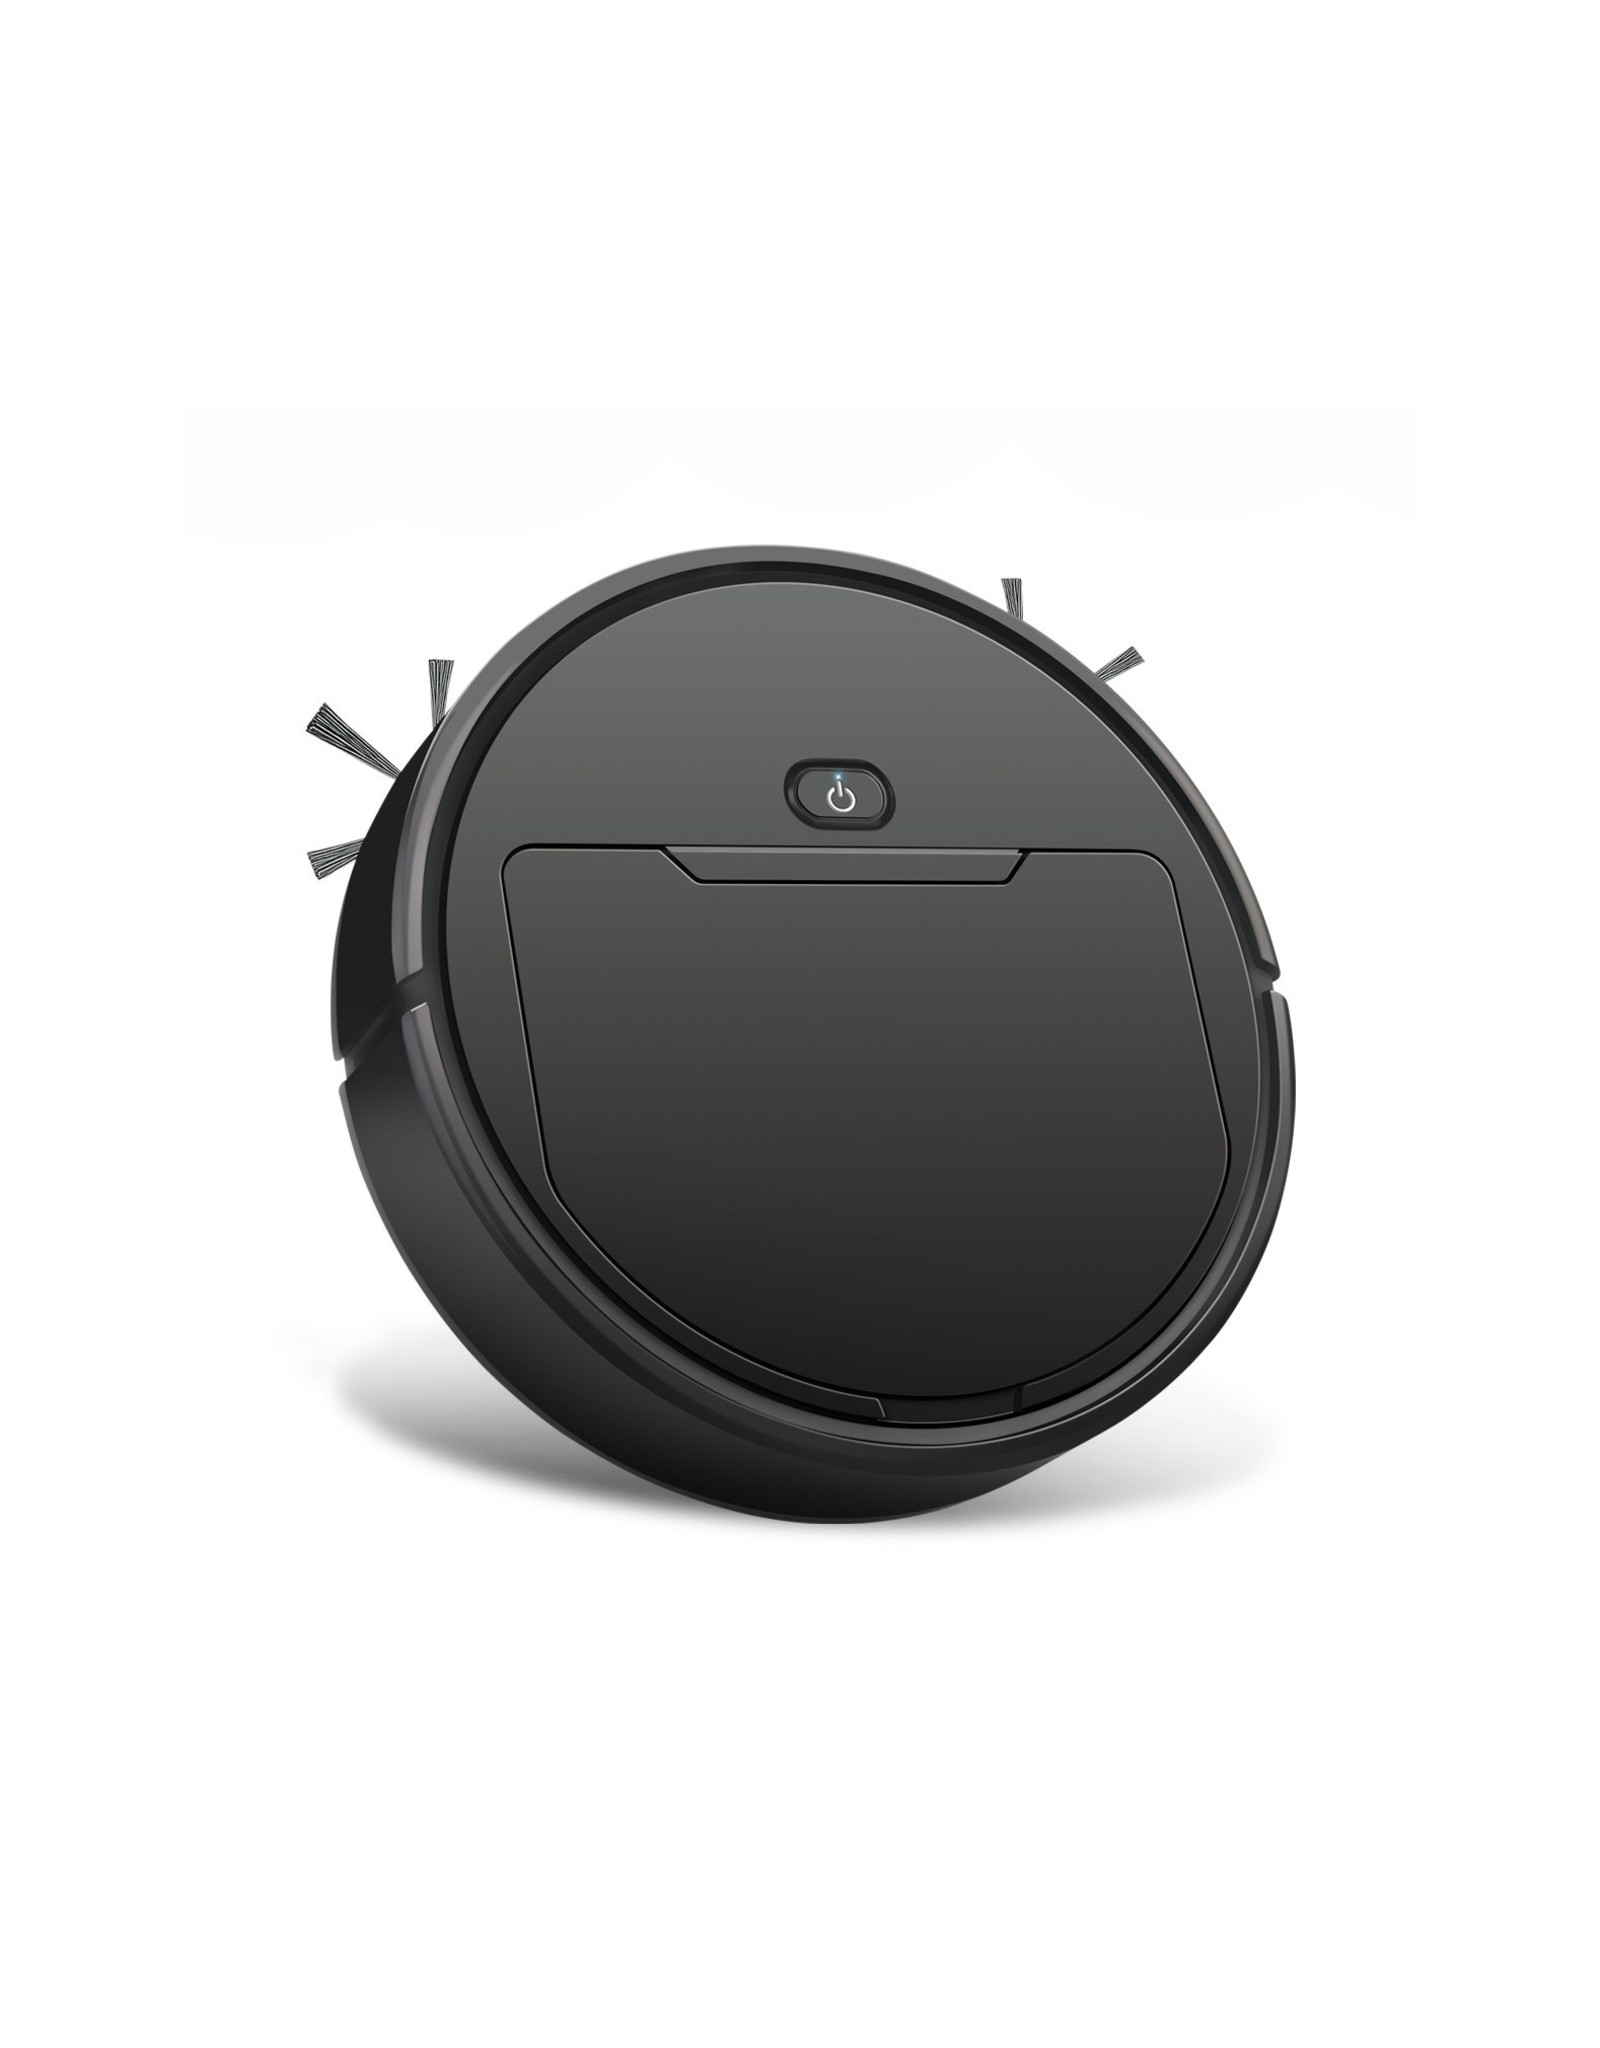 Parya Official Parya Official - Intelligente Robot Stofzuiger - Rond - Draadloos - Zwart